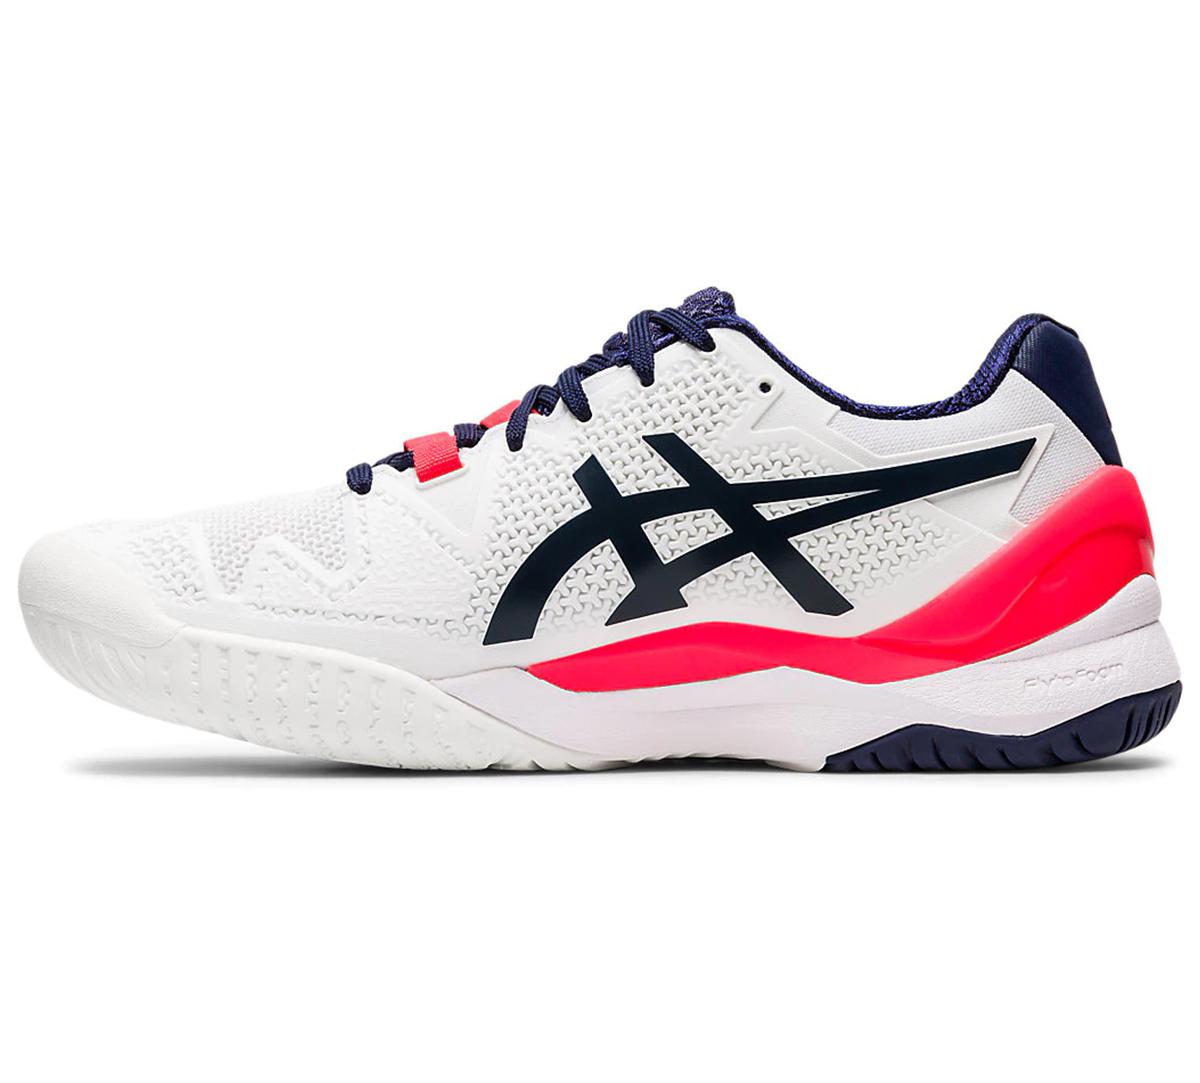 Asics Gel Resolution 8 AC White Peacoat buty tenisowe